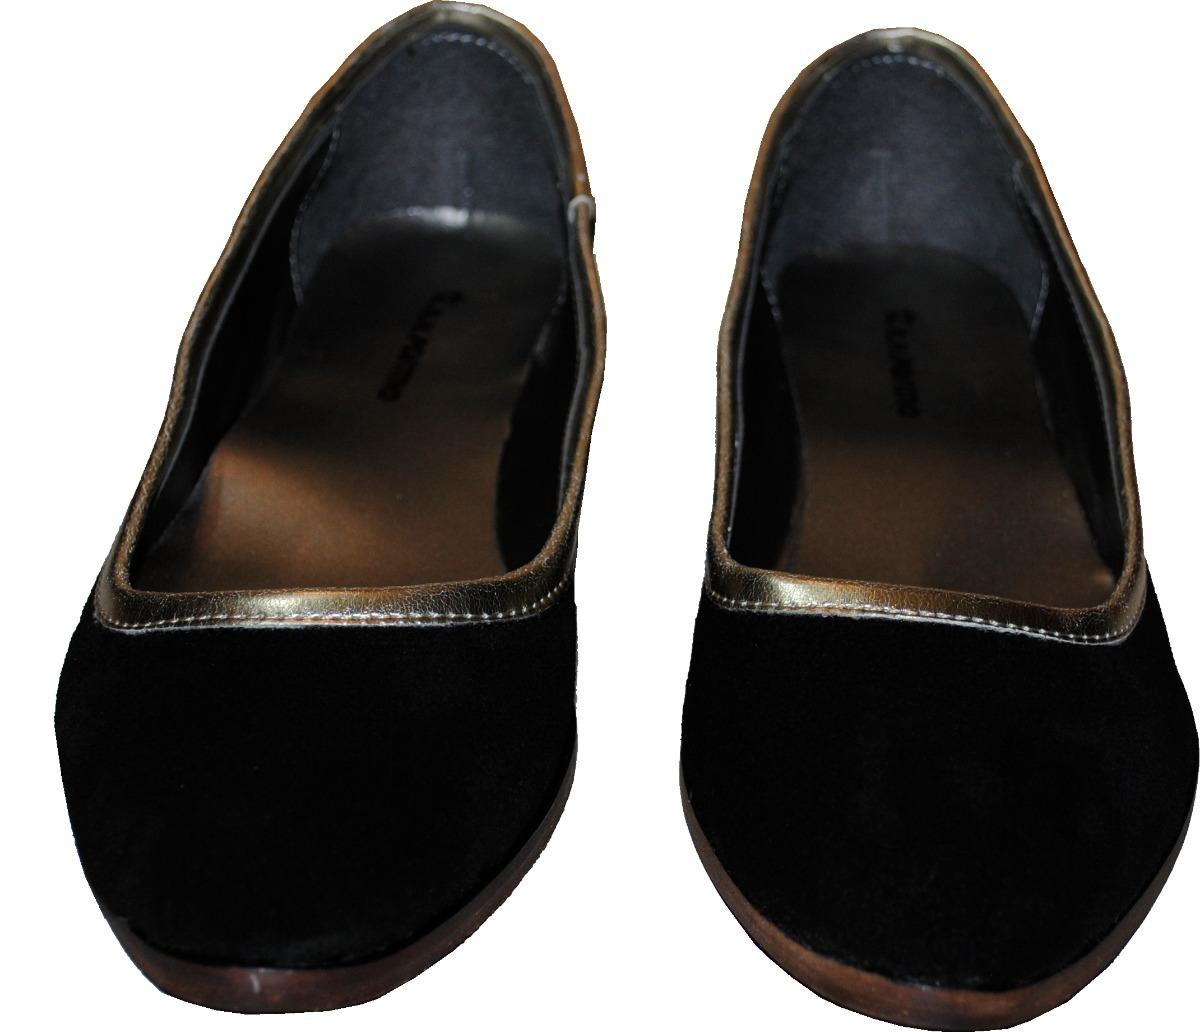 2f0777d487e zapato mujer chatitas balerinas negras gamuza. Cargando zoom... zapato  mujer chatitas. Cargando zoom.